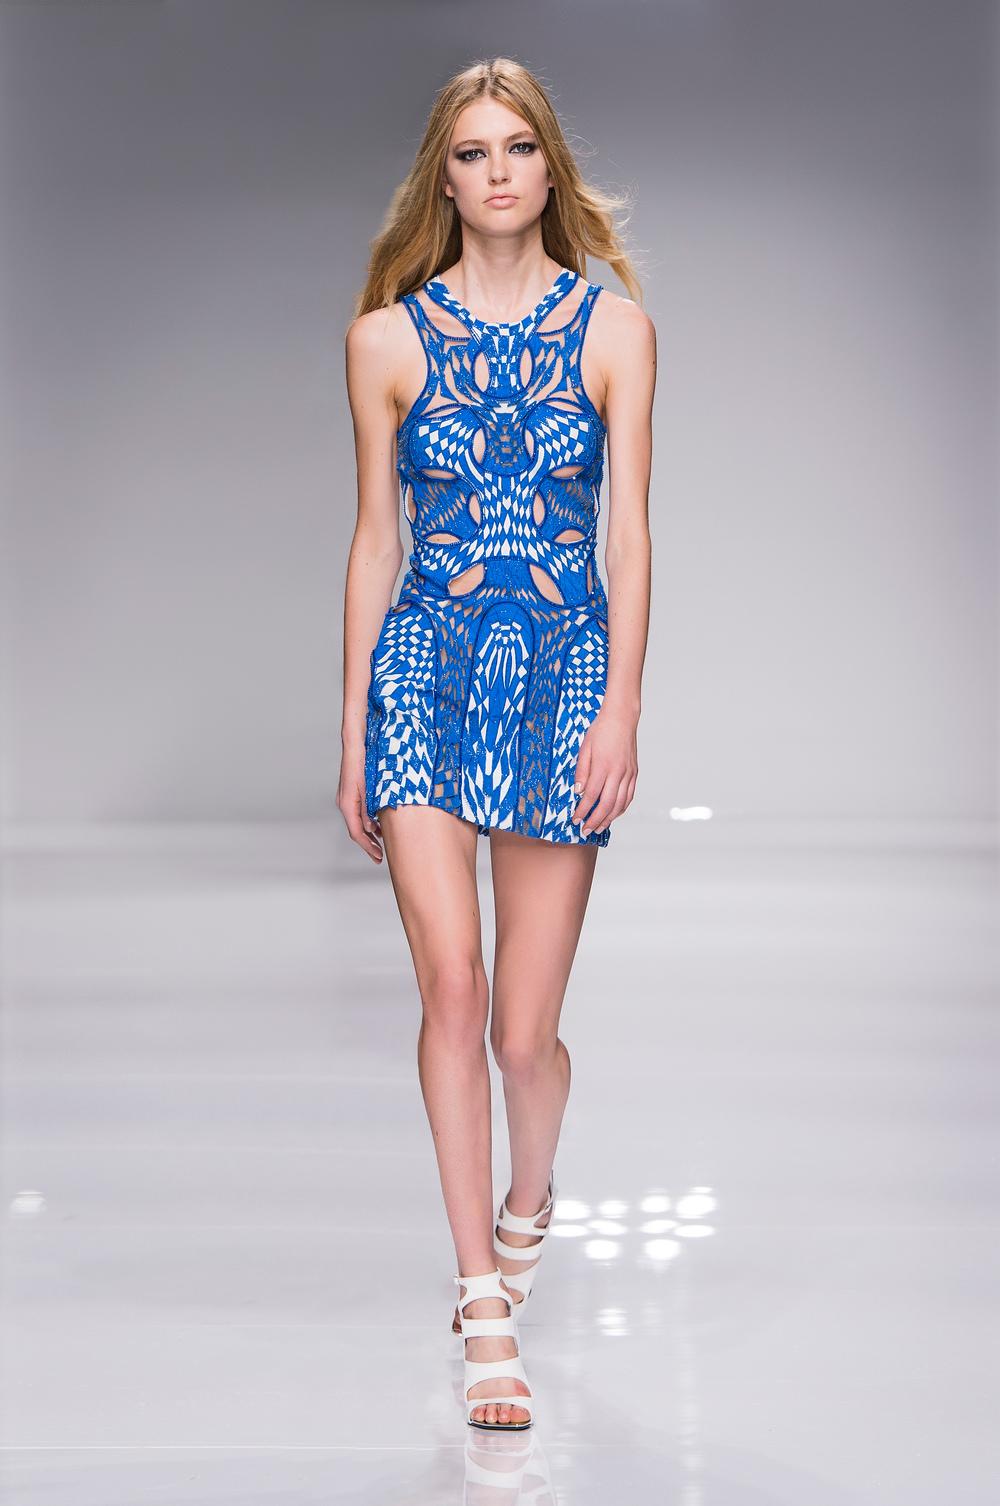 Atelier Versace SS16_Look 22.JPG